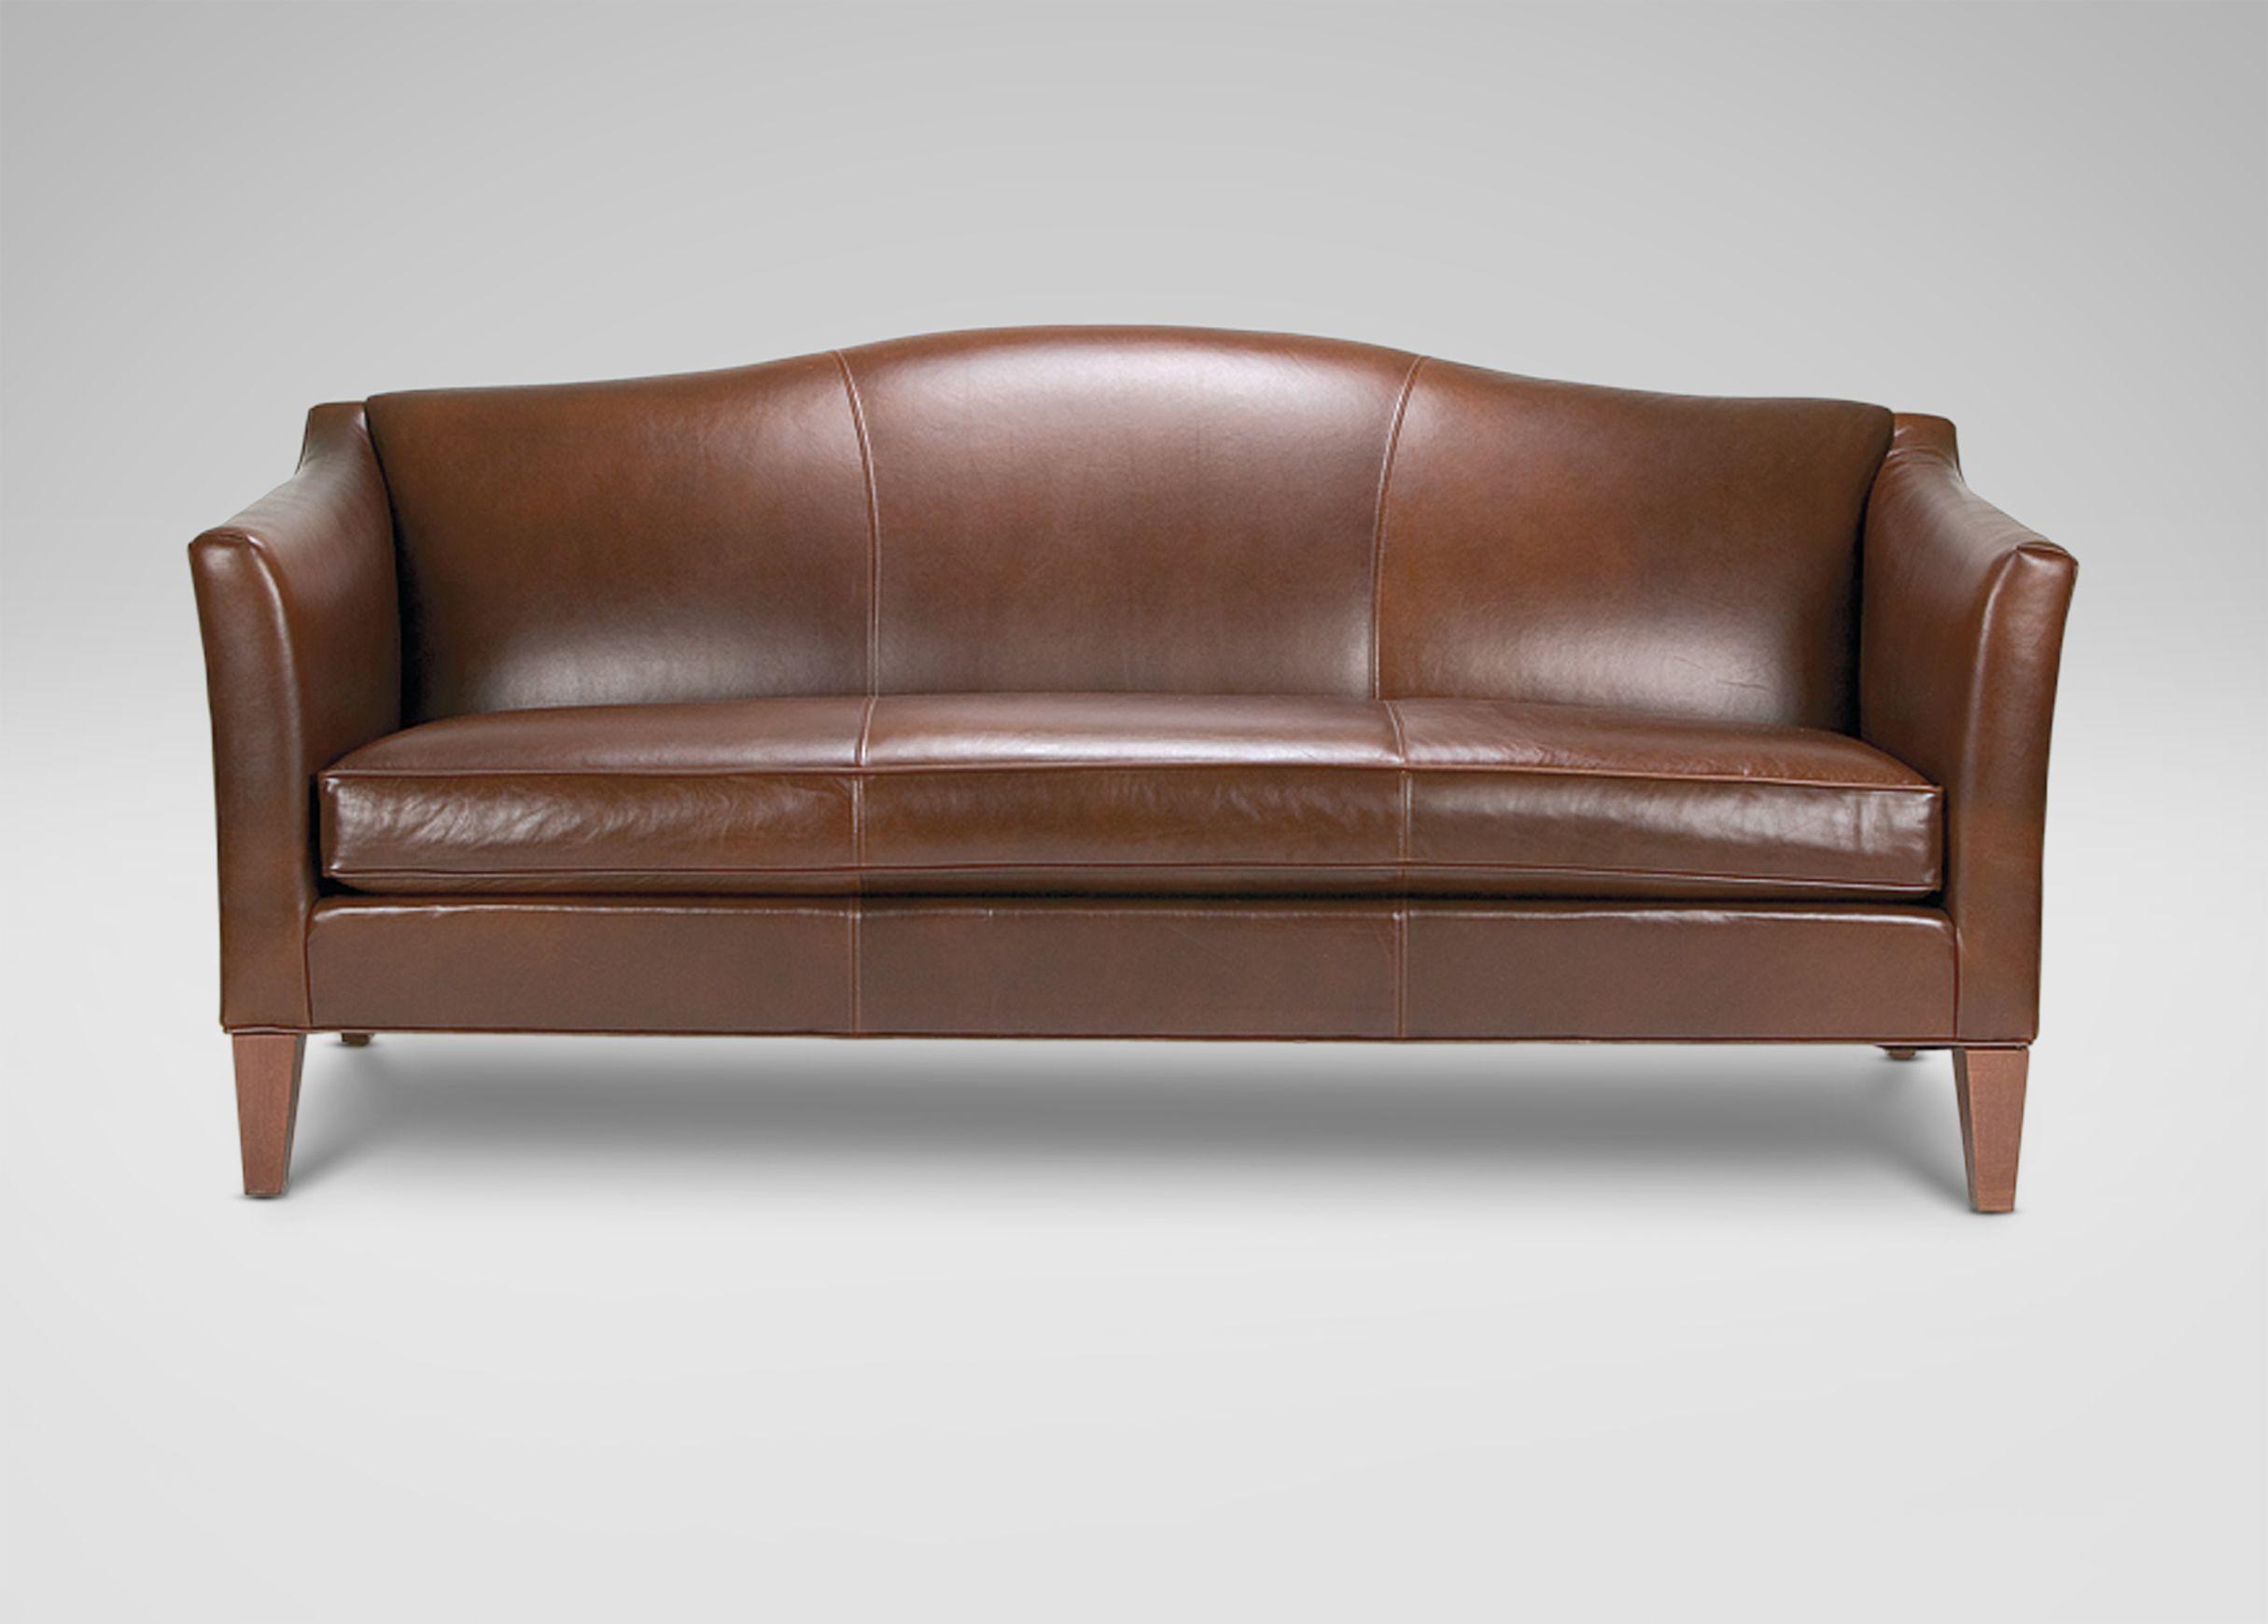 Hartwell Bench Cushion Leather Sofa Ethan Allen Sofa Sleek ...